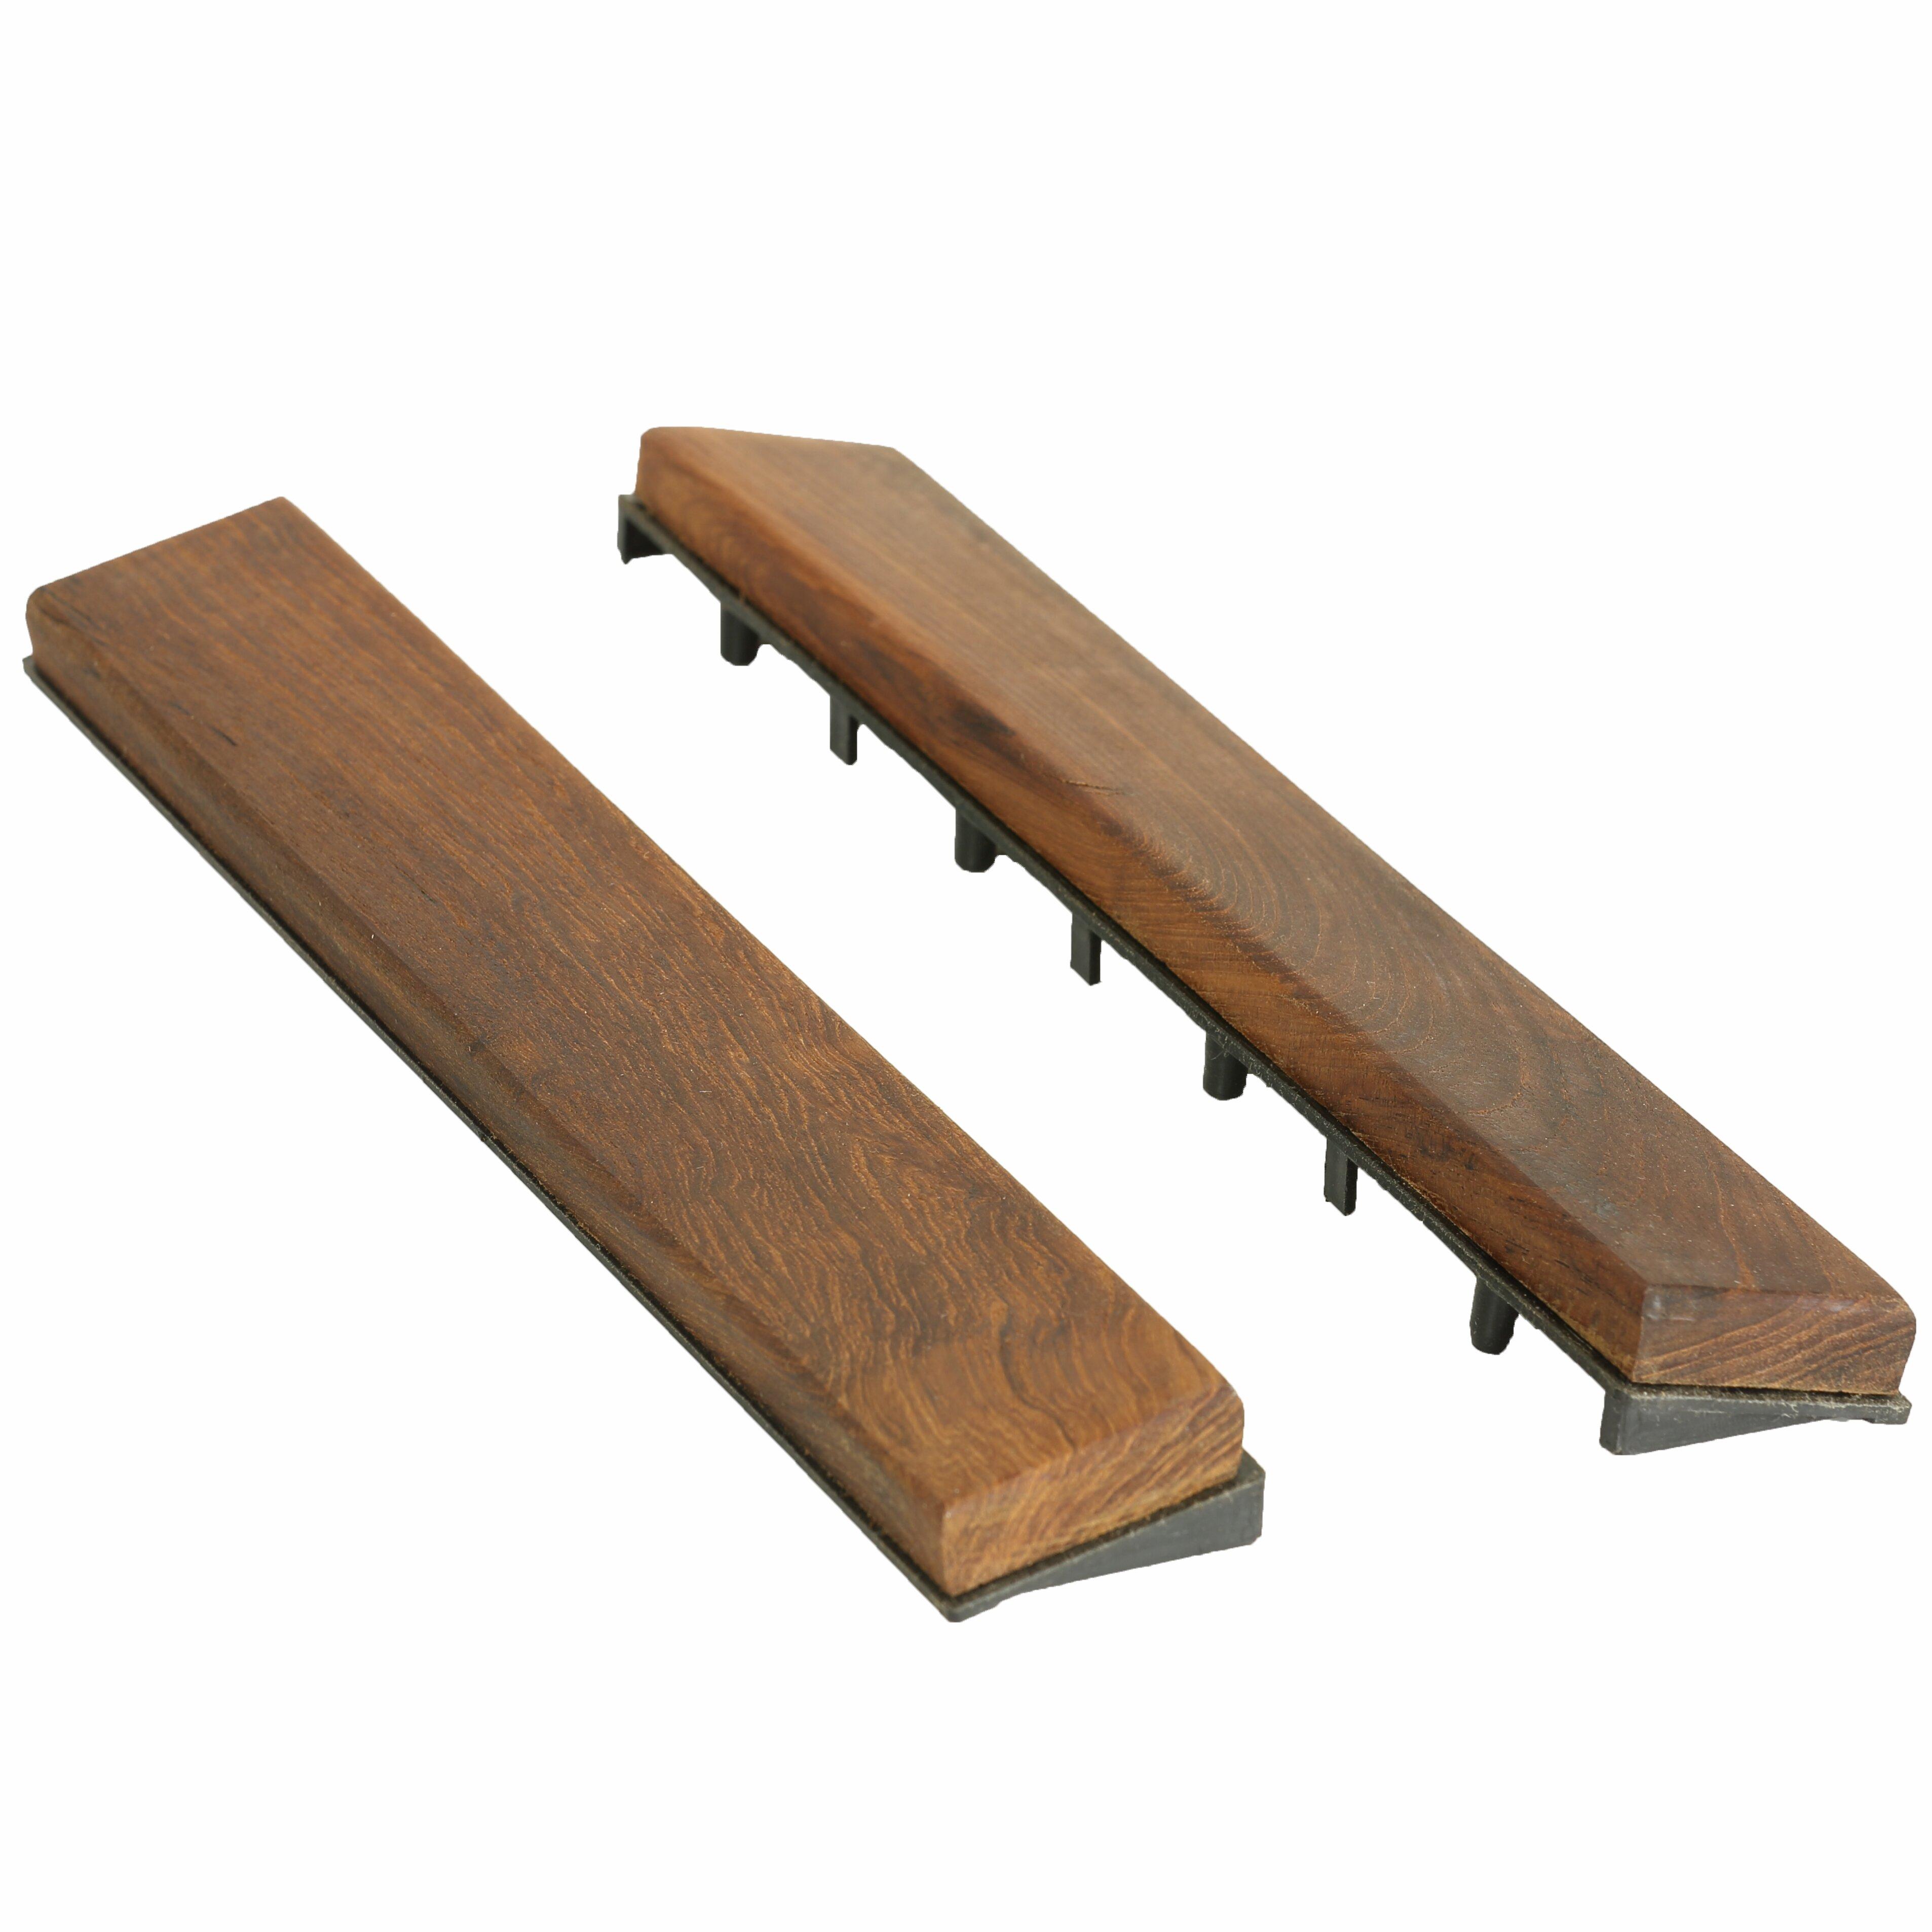 Baredecor Ez Floor Interlocking Flooring Wood 12 X 1 End